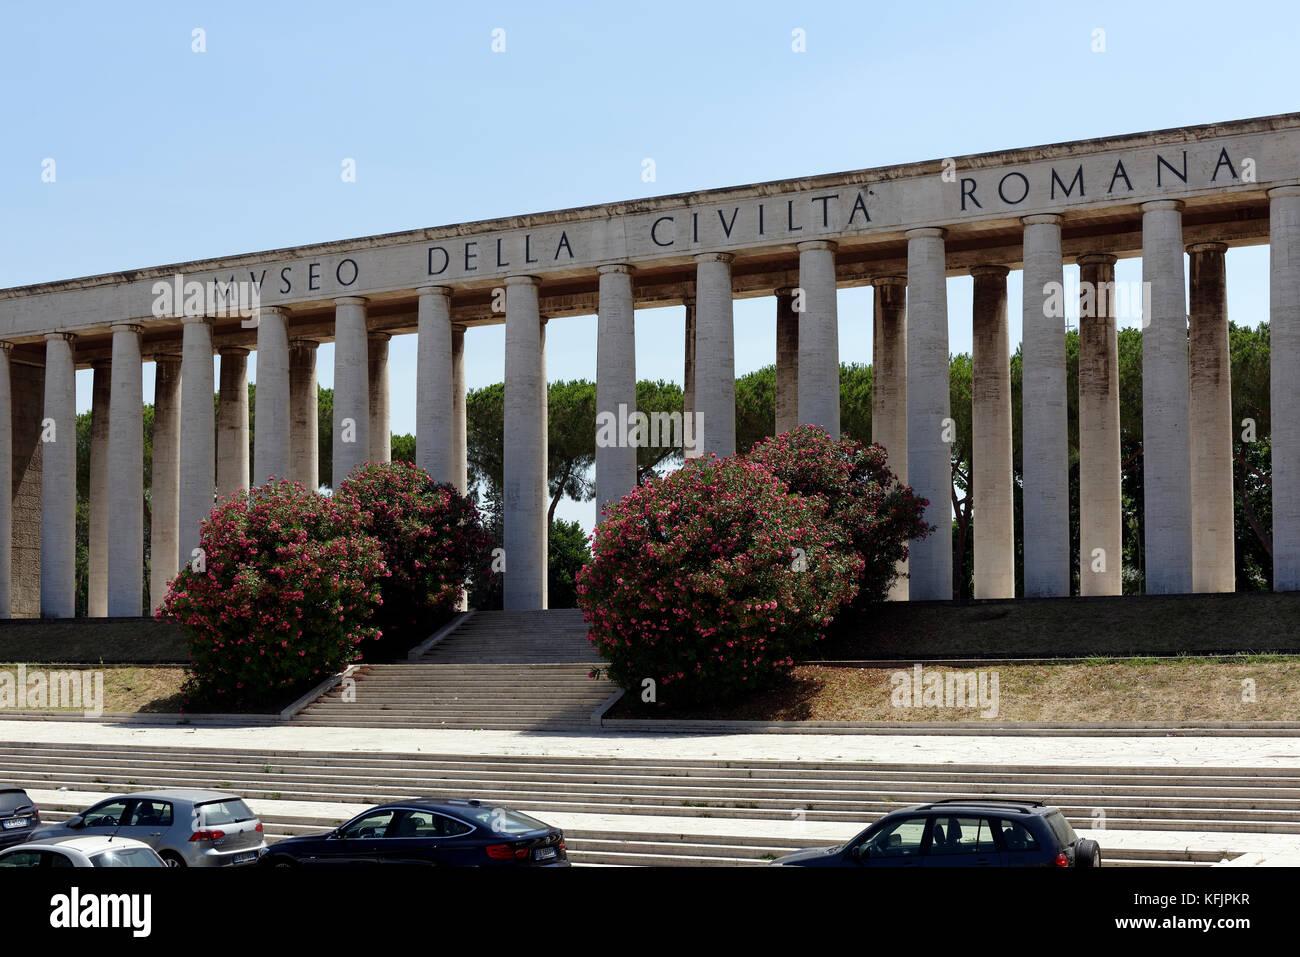 Exterior view of the Museum of Roman Civilisation (Museo della Civilta Romana). EUR, Rome, Italy. - Stock Image